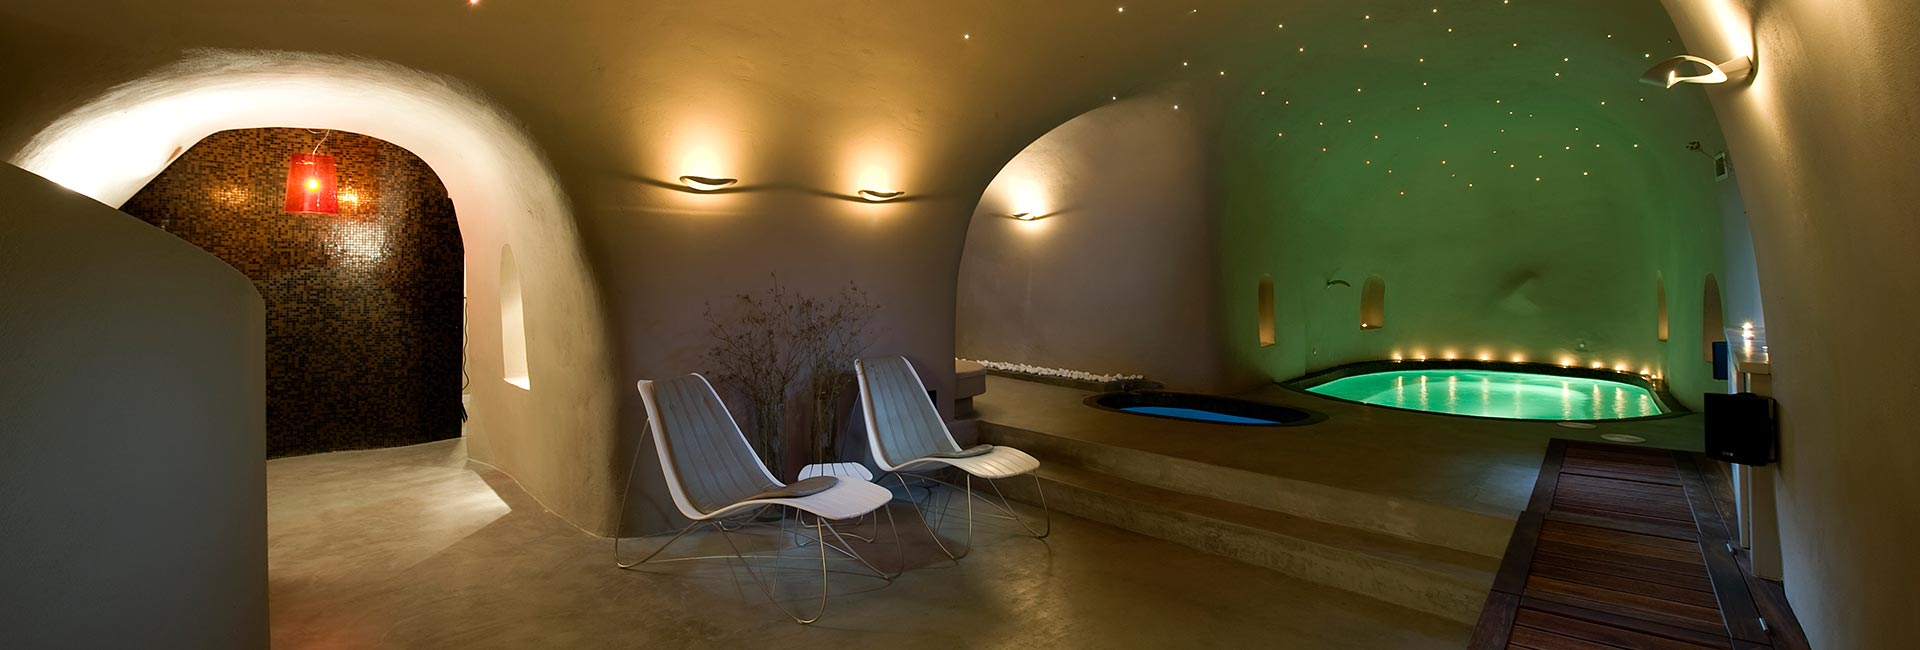 olive green bathroom decor ideas for your luxury bathroom.htm avaton lifestyle spa menu imerovigli santorini spa massages  imerovigli santorini spa